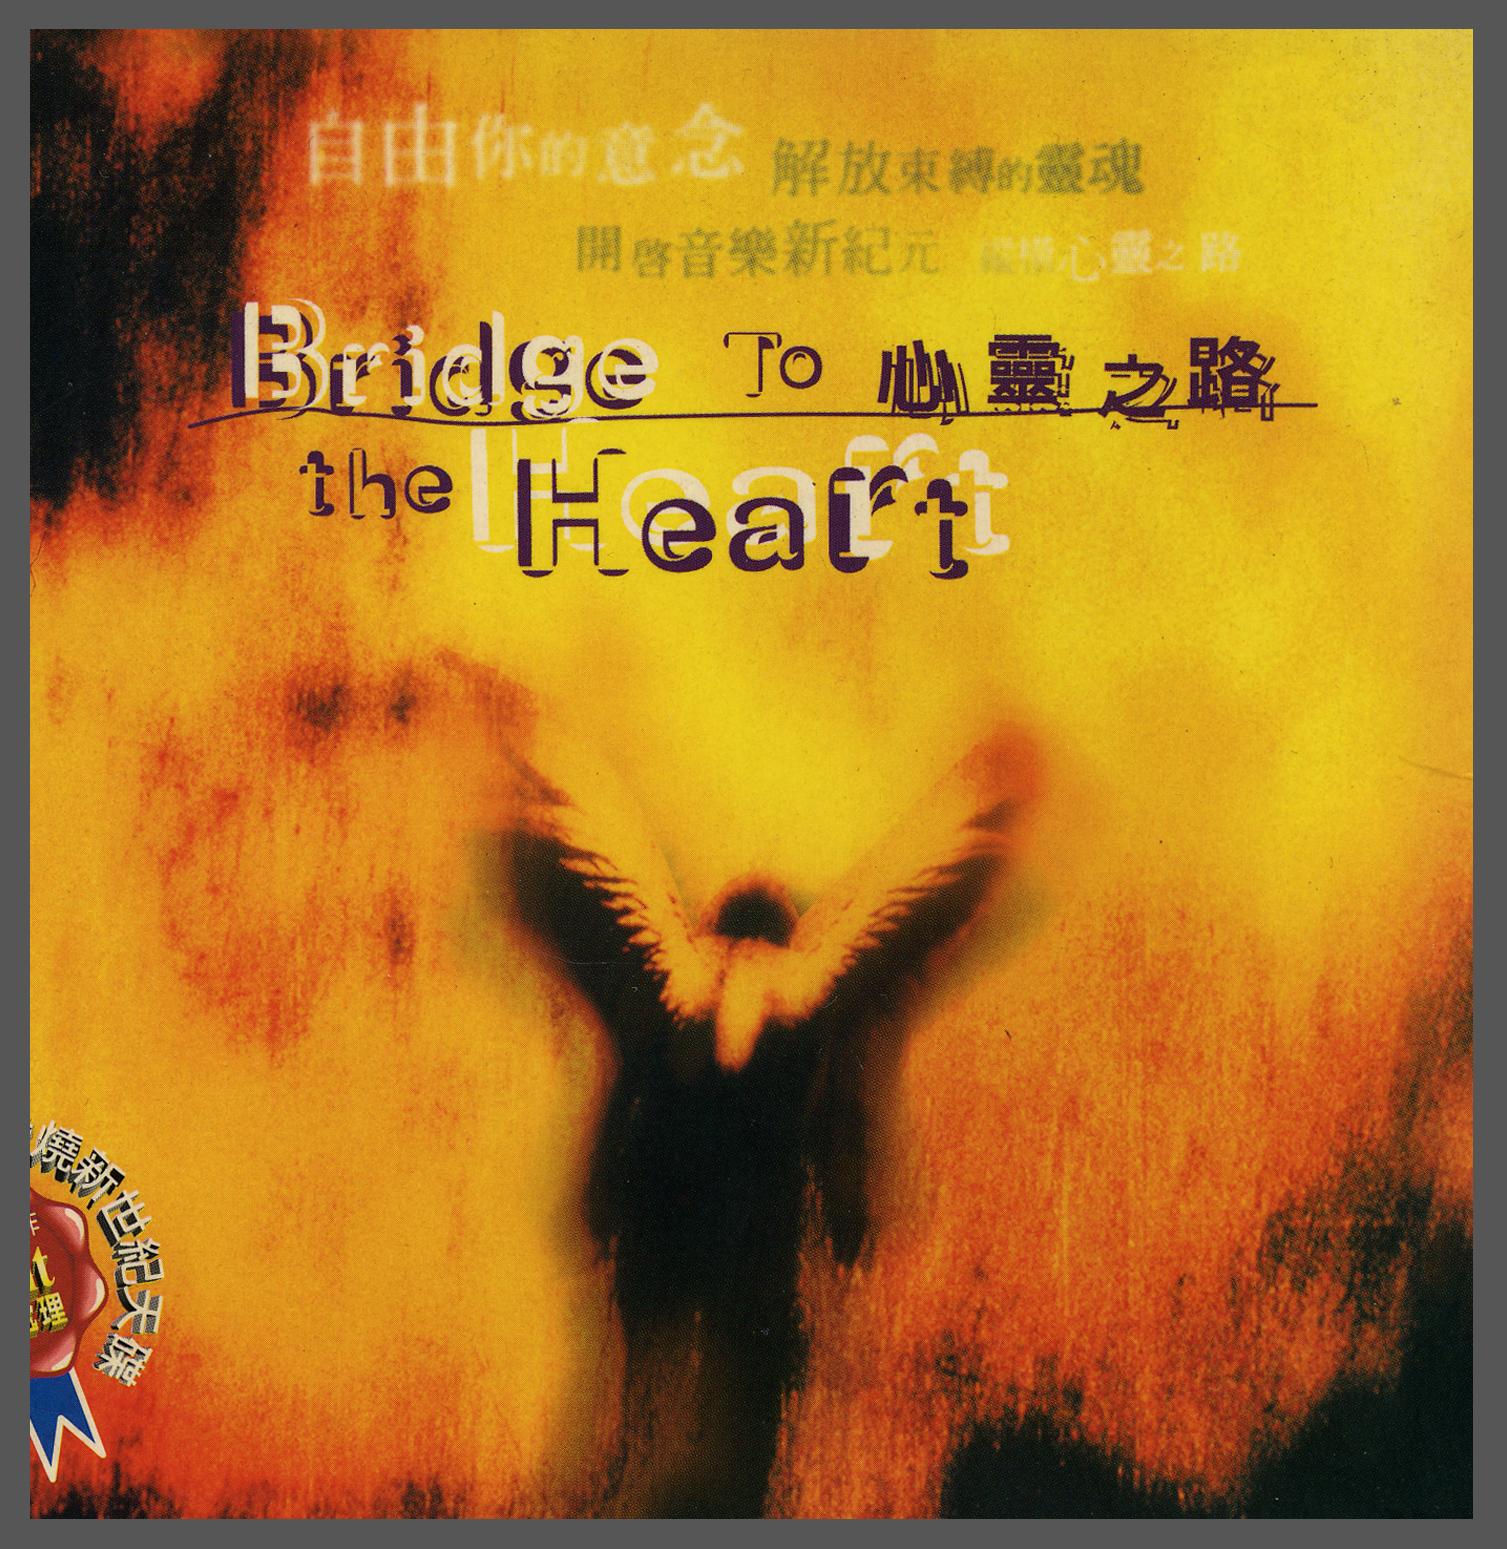 Bridge to the heart-Gallery